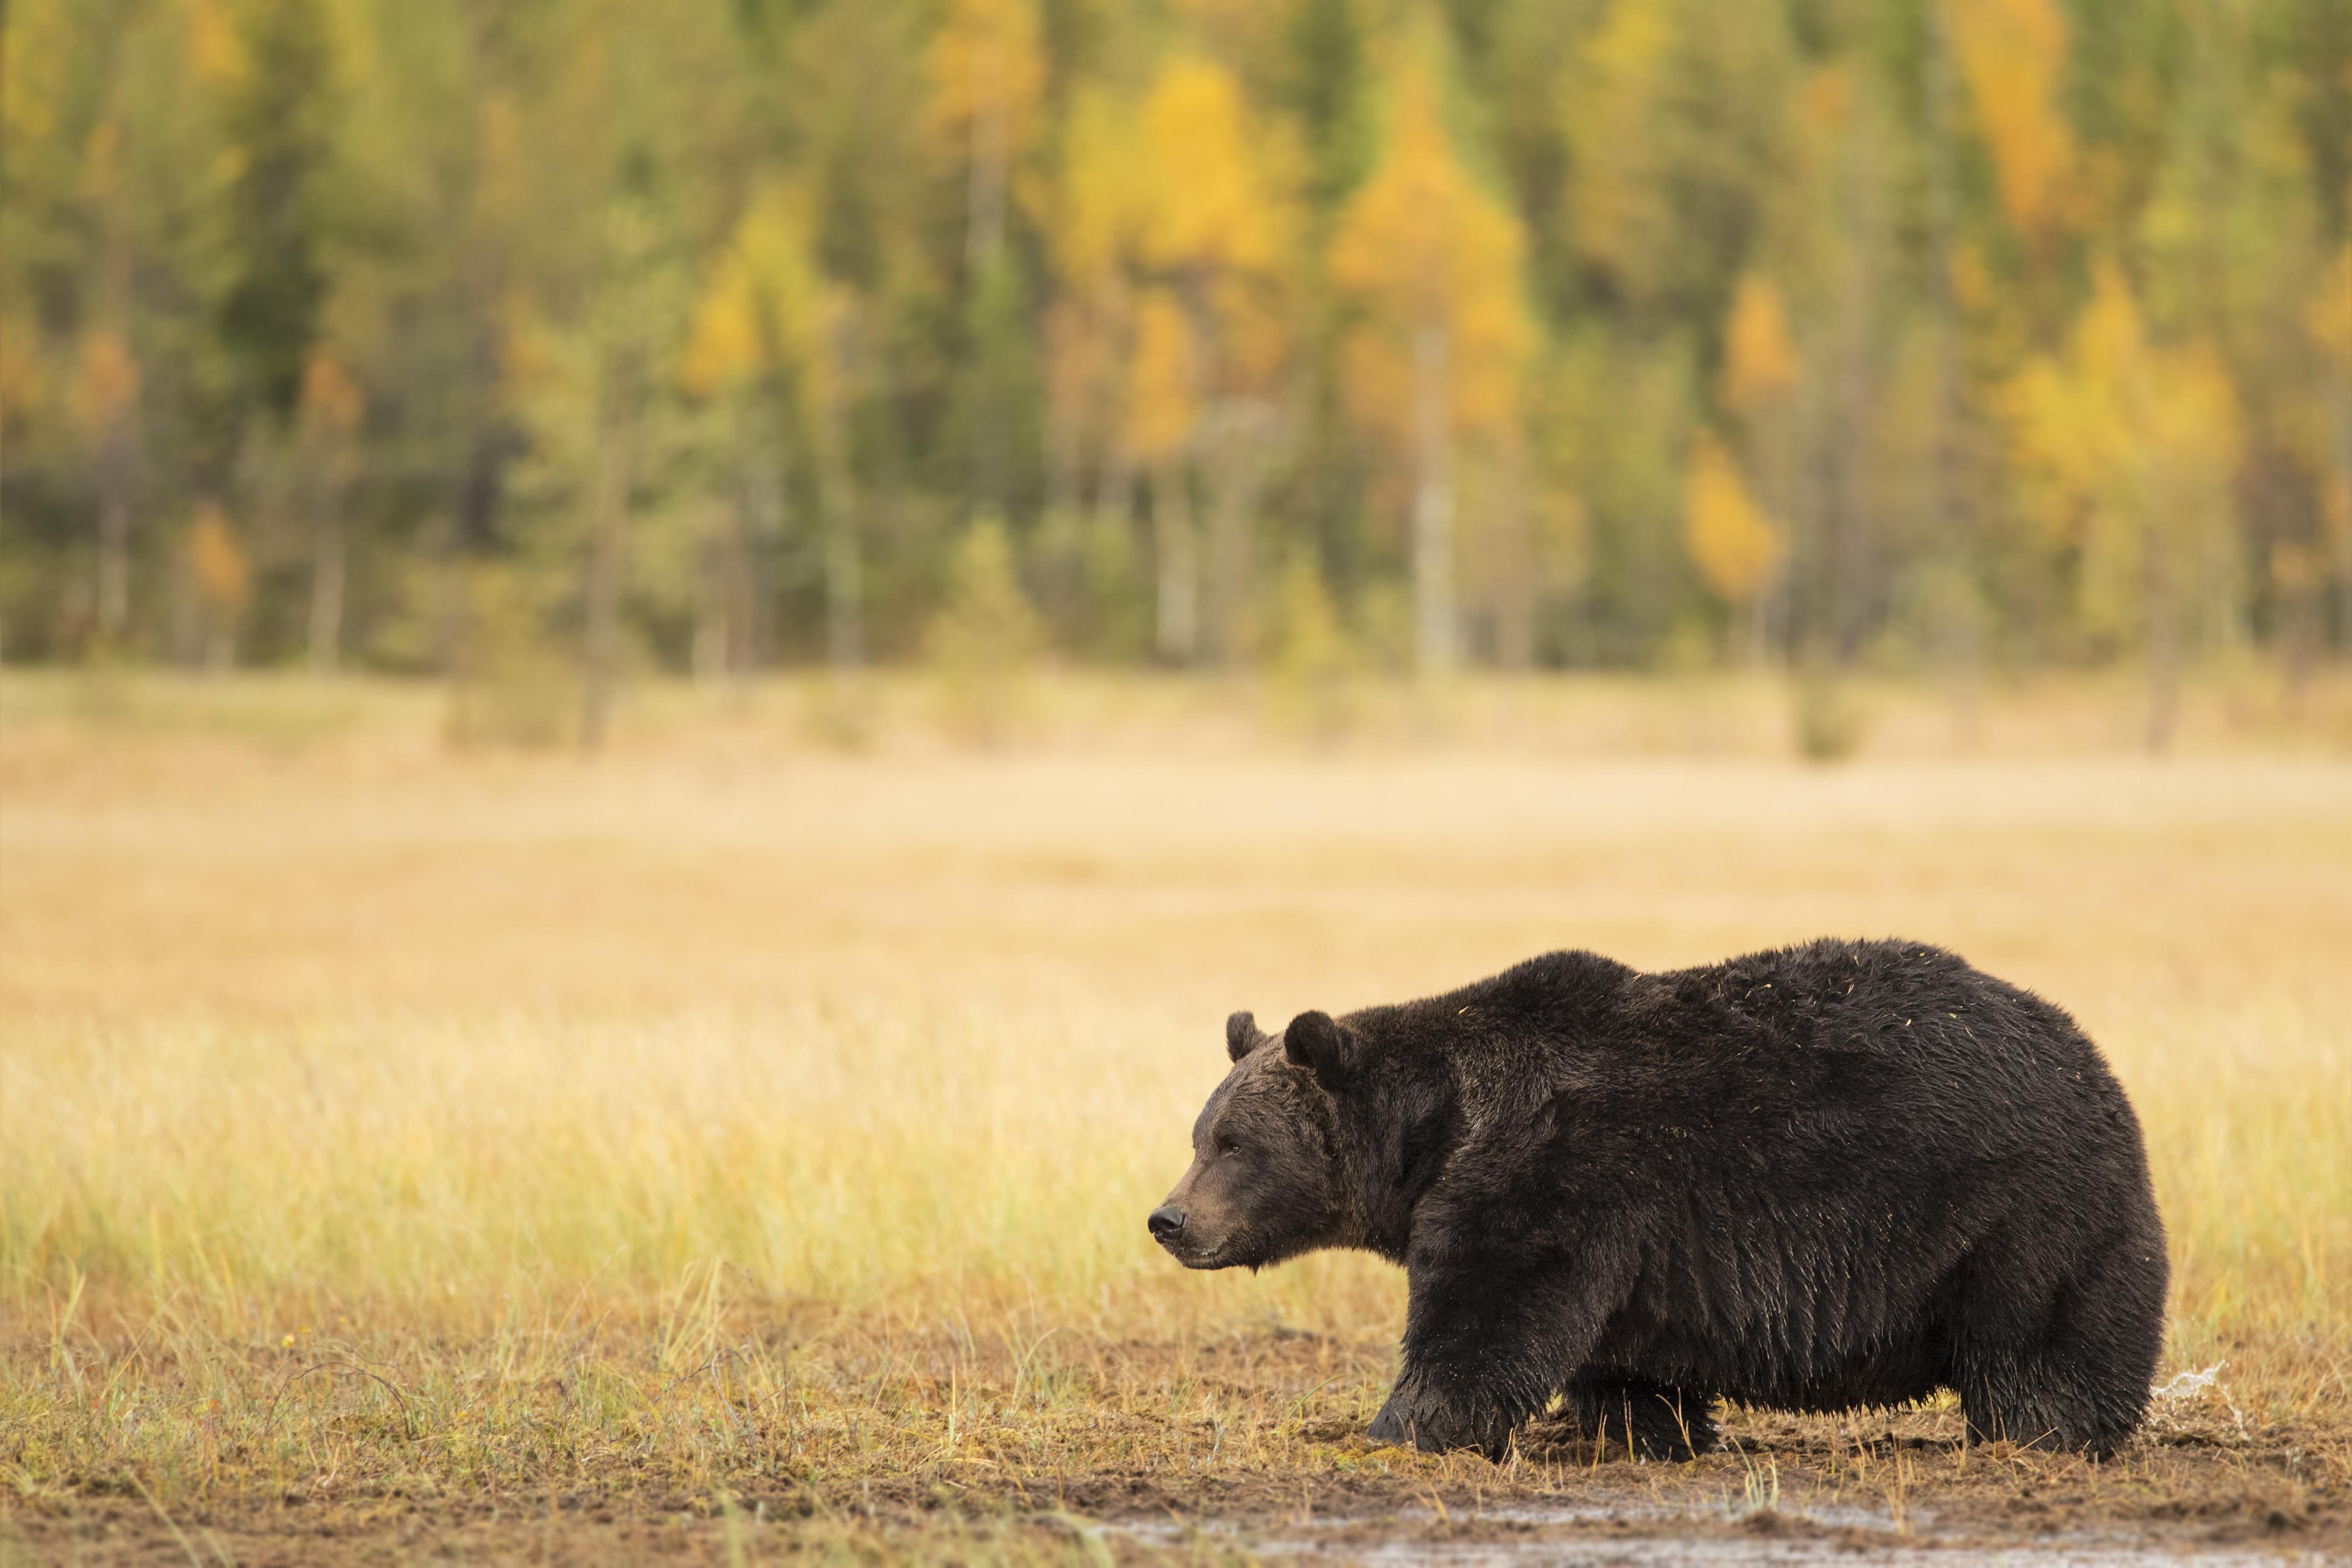 Nature_talks-fotoreis-finland-beer-brown_beer-petersmoments